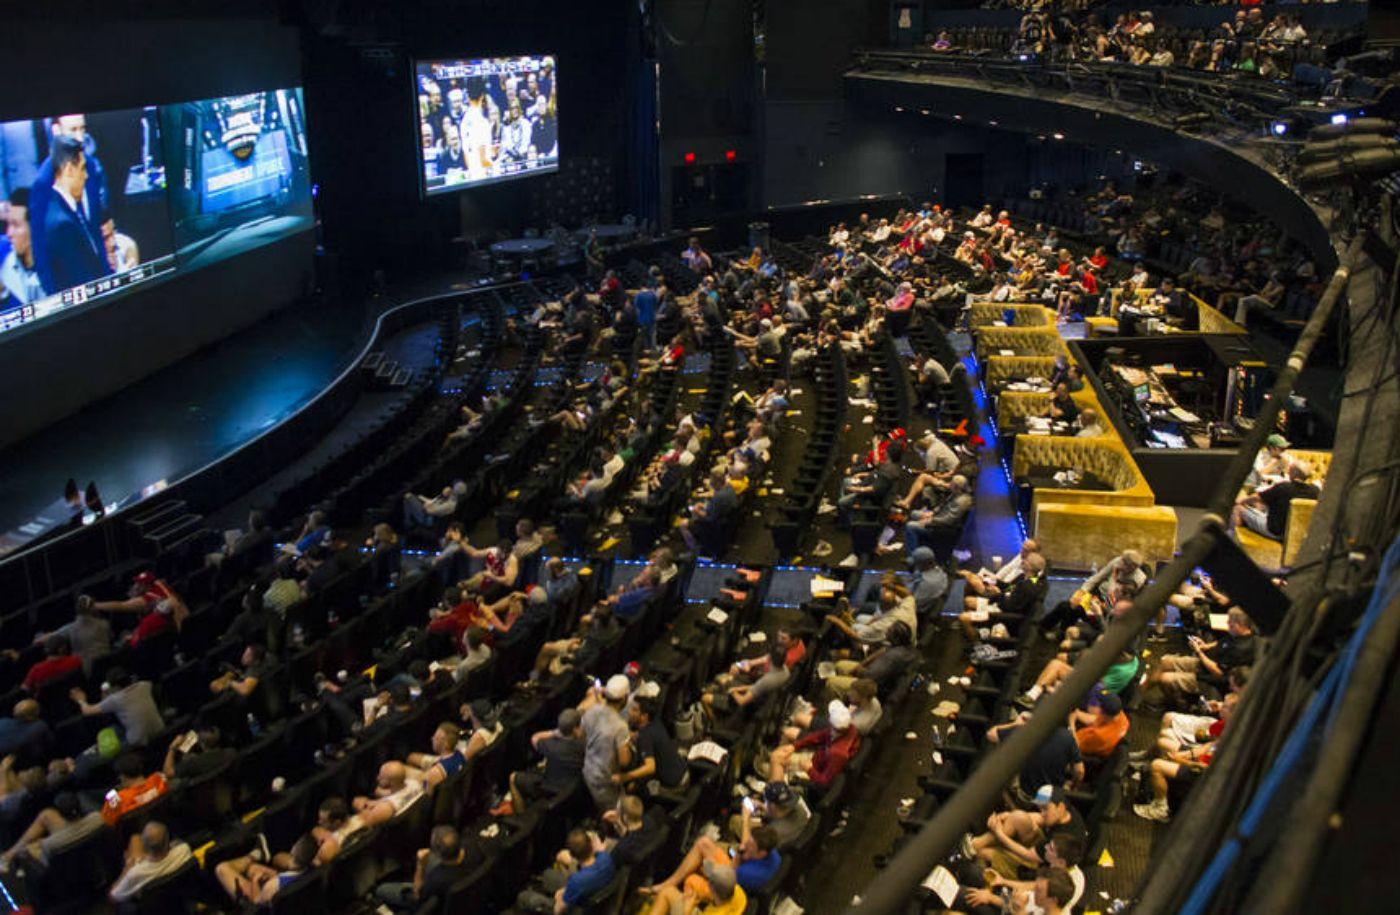 Nevada Casinos Top 1 Billion in March, Sportsbooks Set